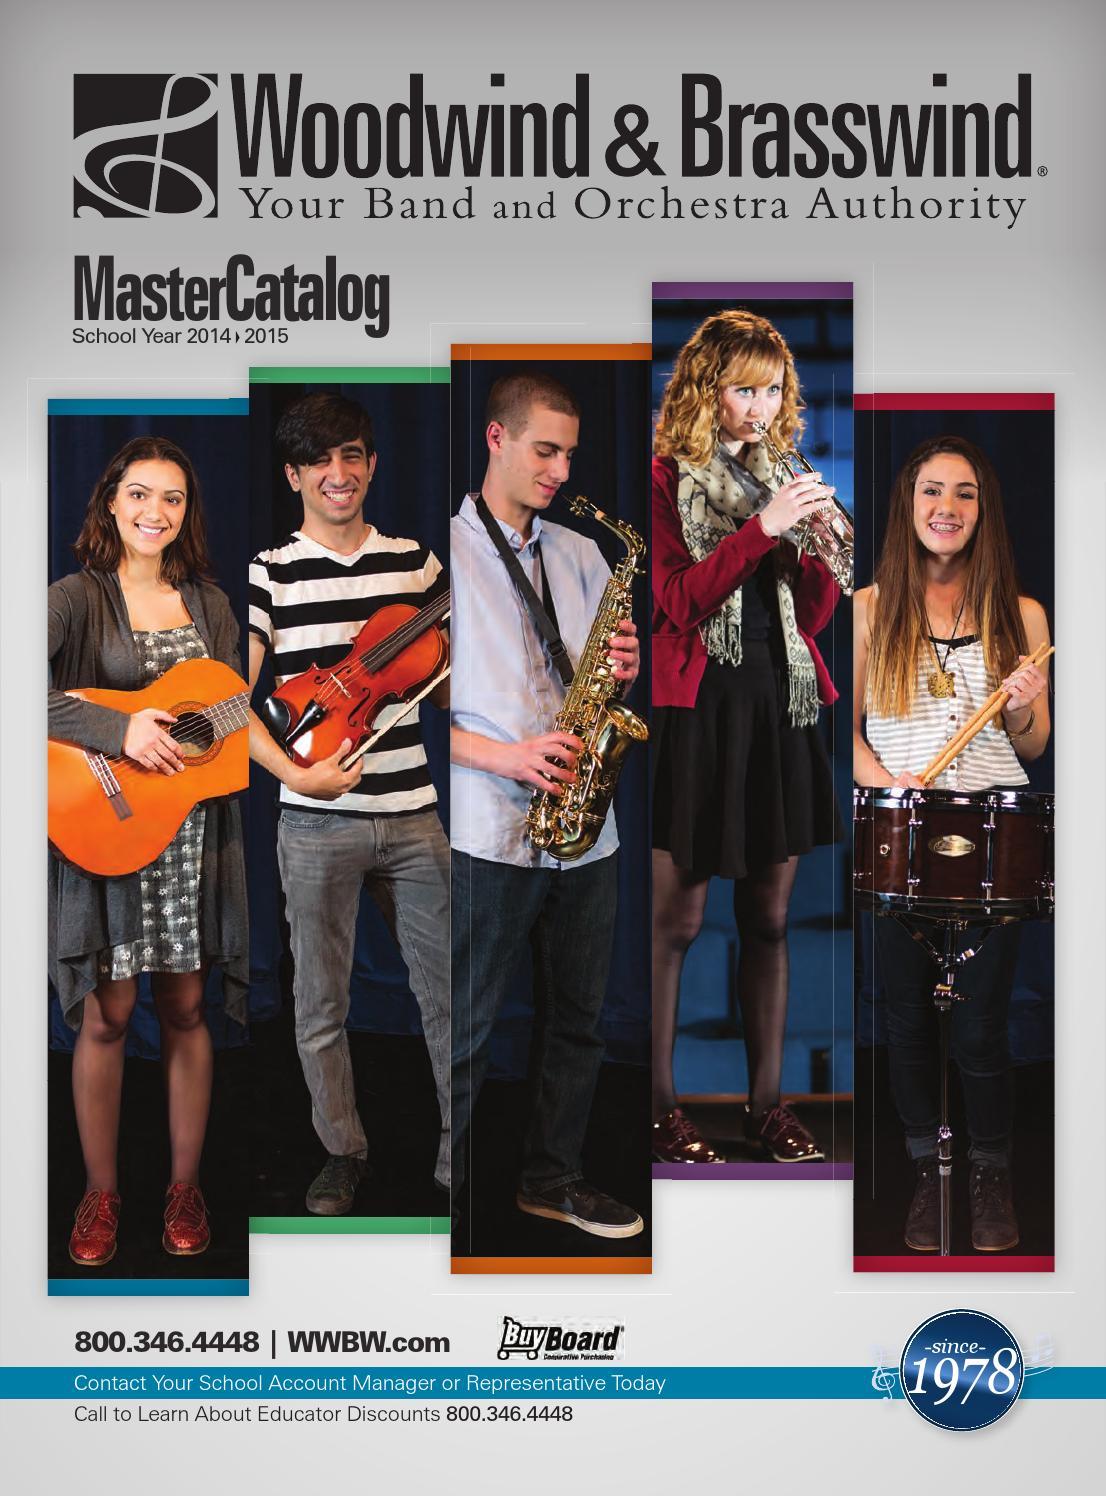 Sm1403 School Master Catalog 2014 2015 By Woodwind Brasswind Issuu Church Gear Sl 3242ai Macbook Pro 13quot 25ghz I5 Ipad 2 4x